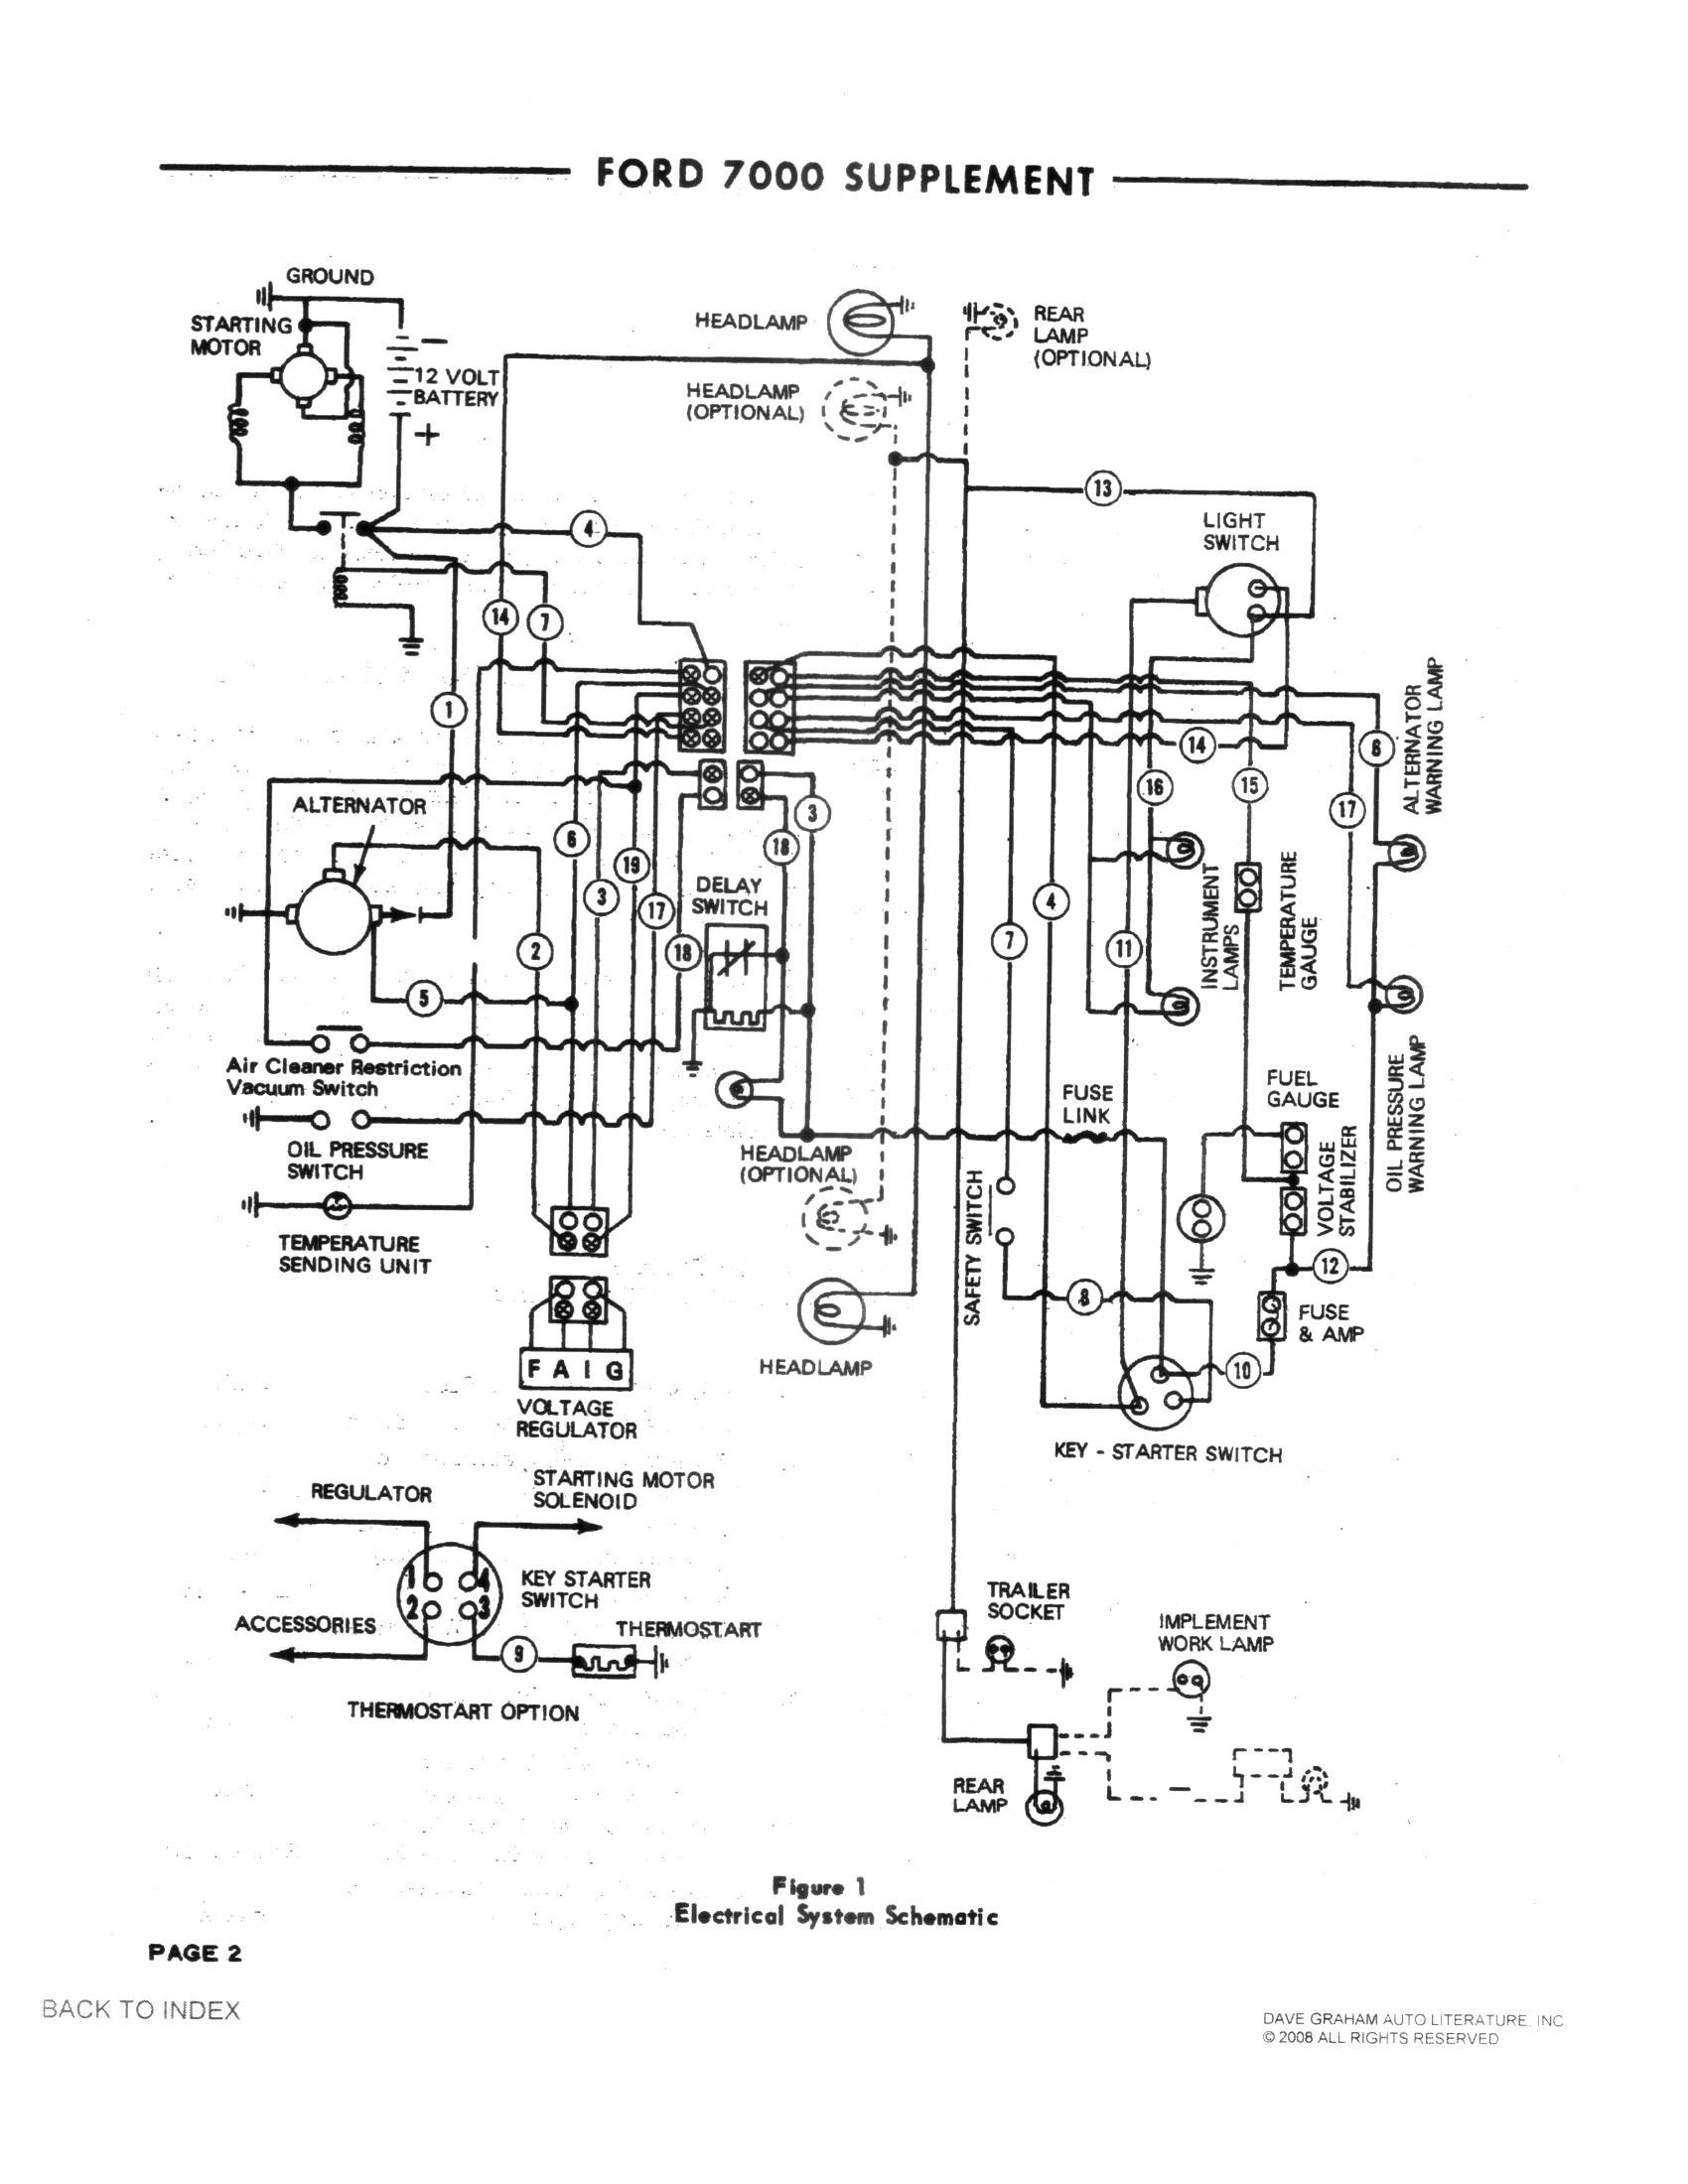 motorola alternator wiring diagram john deere wiring diagram hostunique motorola alternator wiring diagram john deere diagrams [ 1700 x 2200 Pixel ]